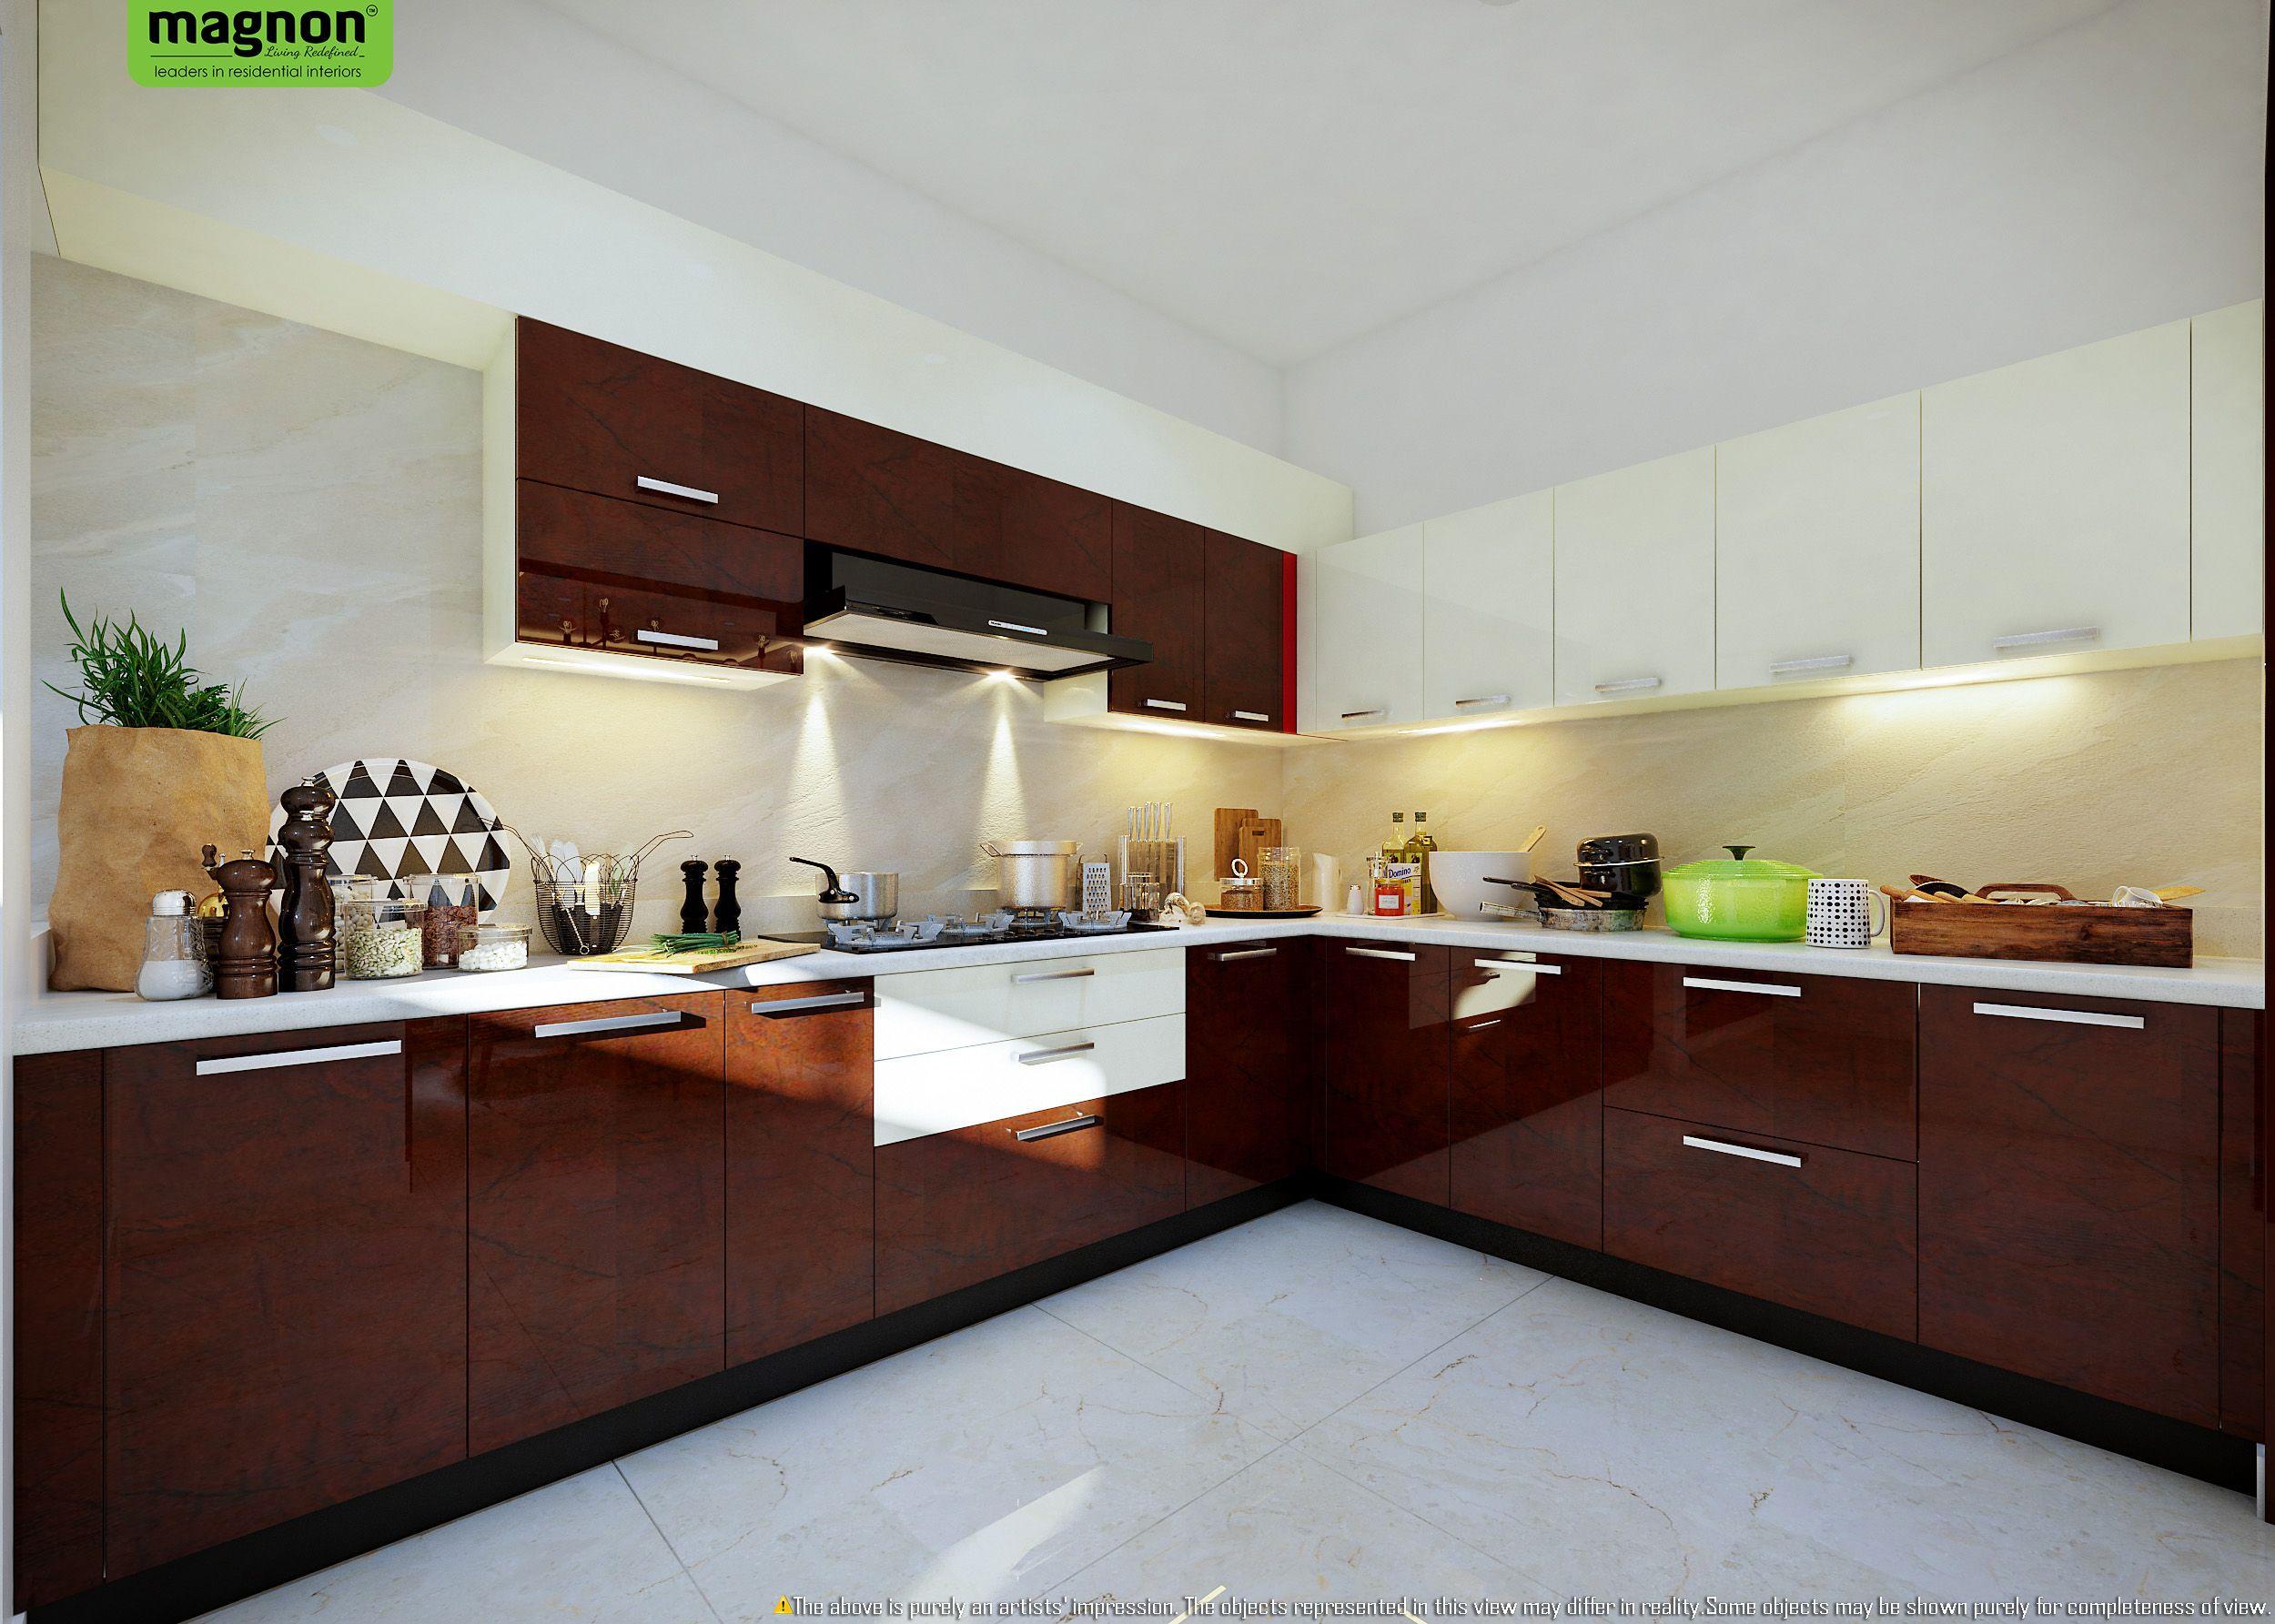 Magnon India Kitchen Design Kitchen Furniture Design Interior Design Kitchen